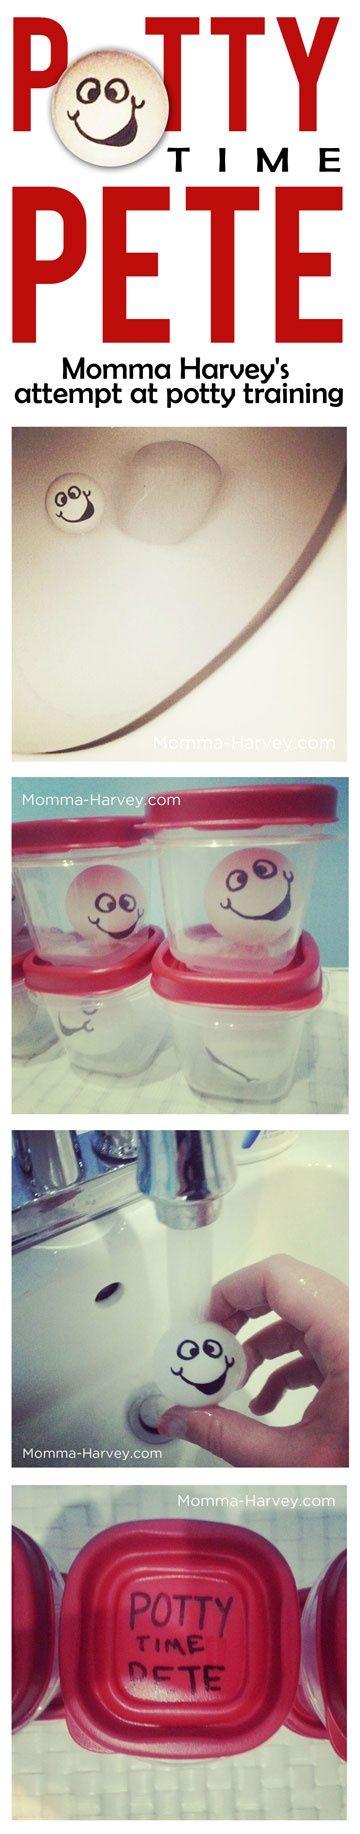 A fun, home-made potty training idea. It's been successful so far! :D: